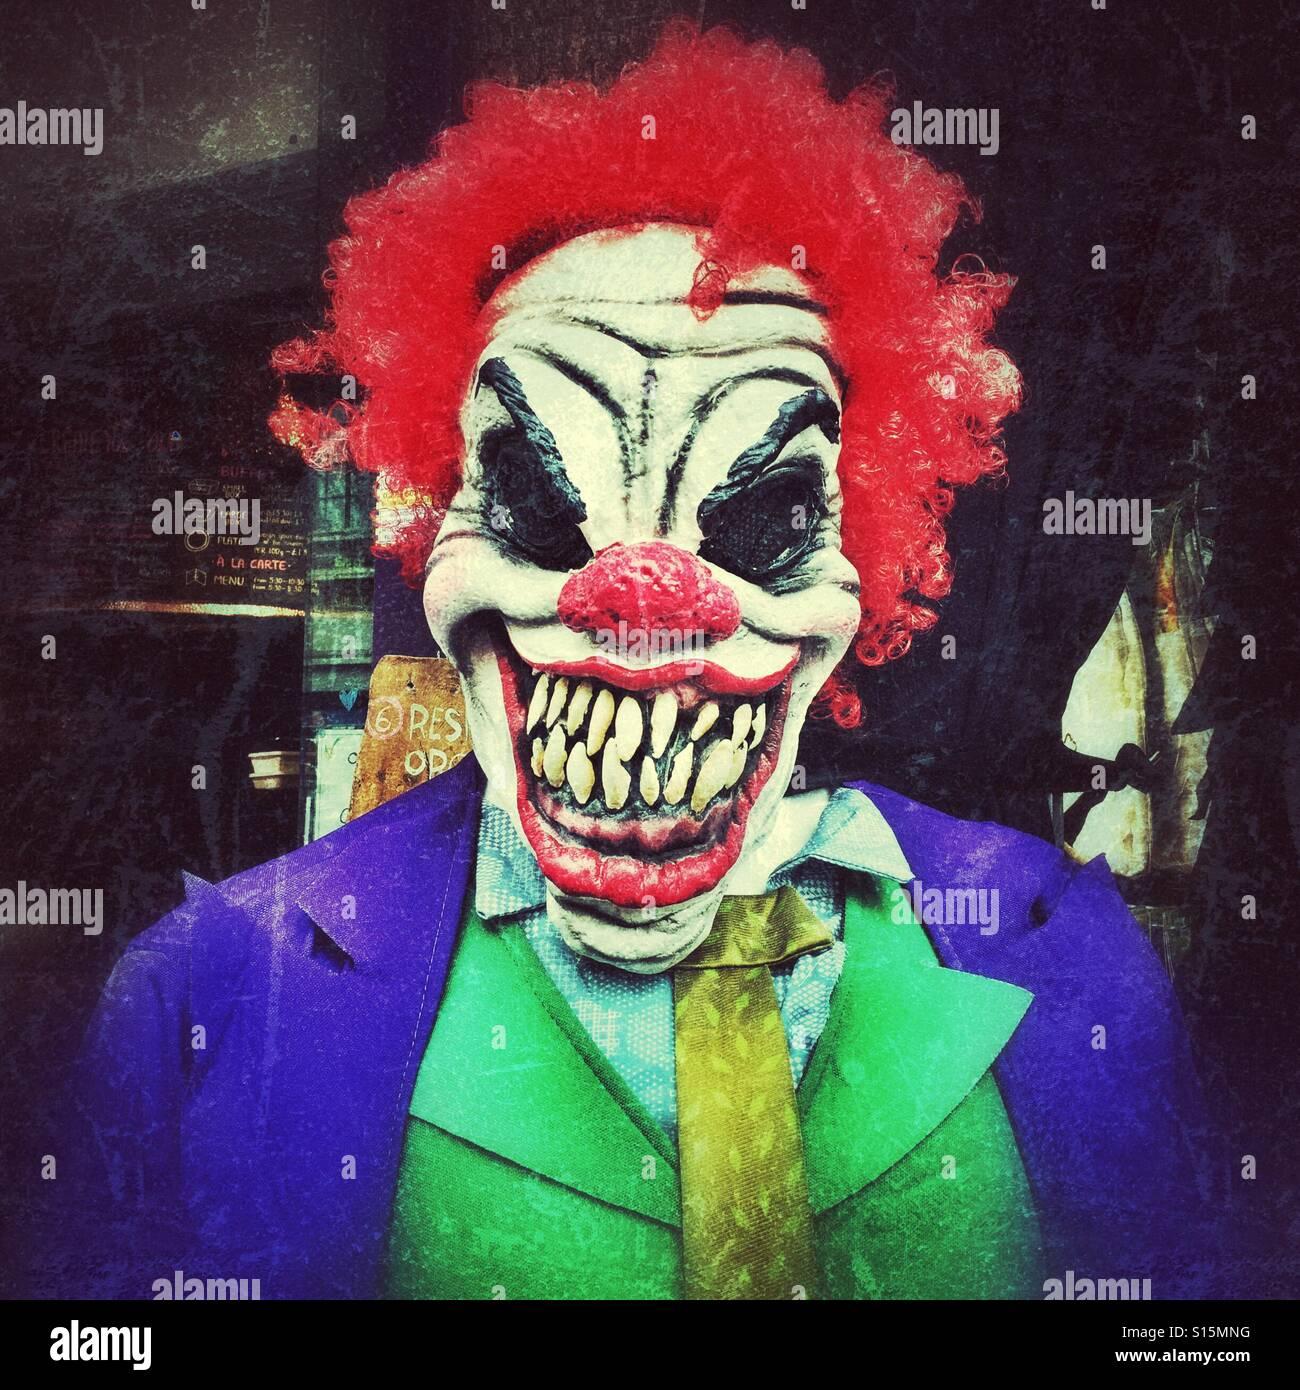 Joker (character) - Wikipedia